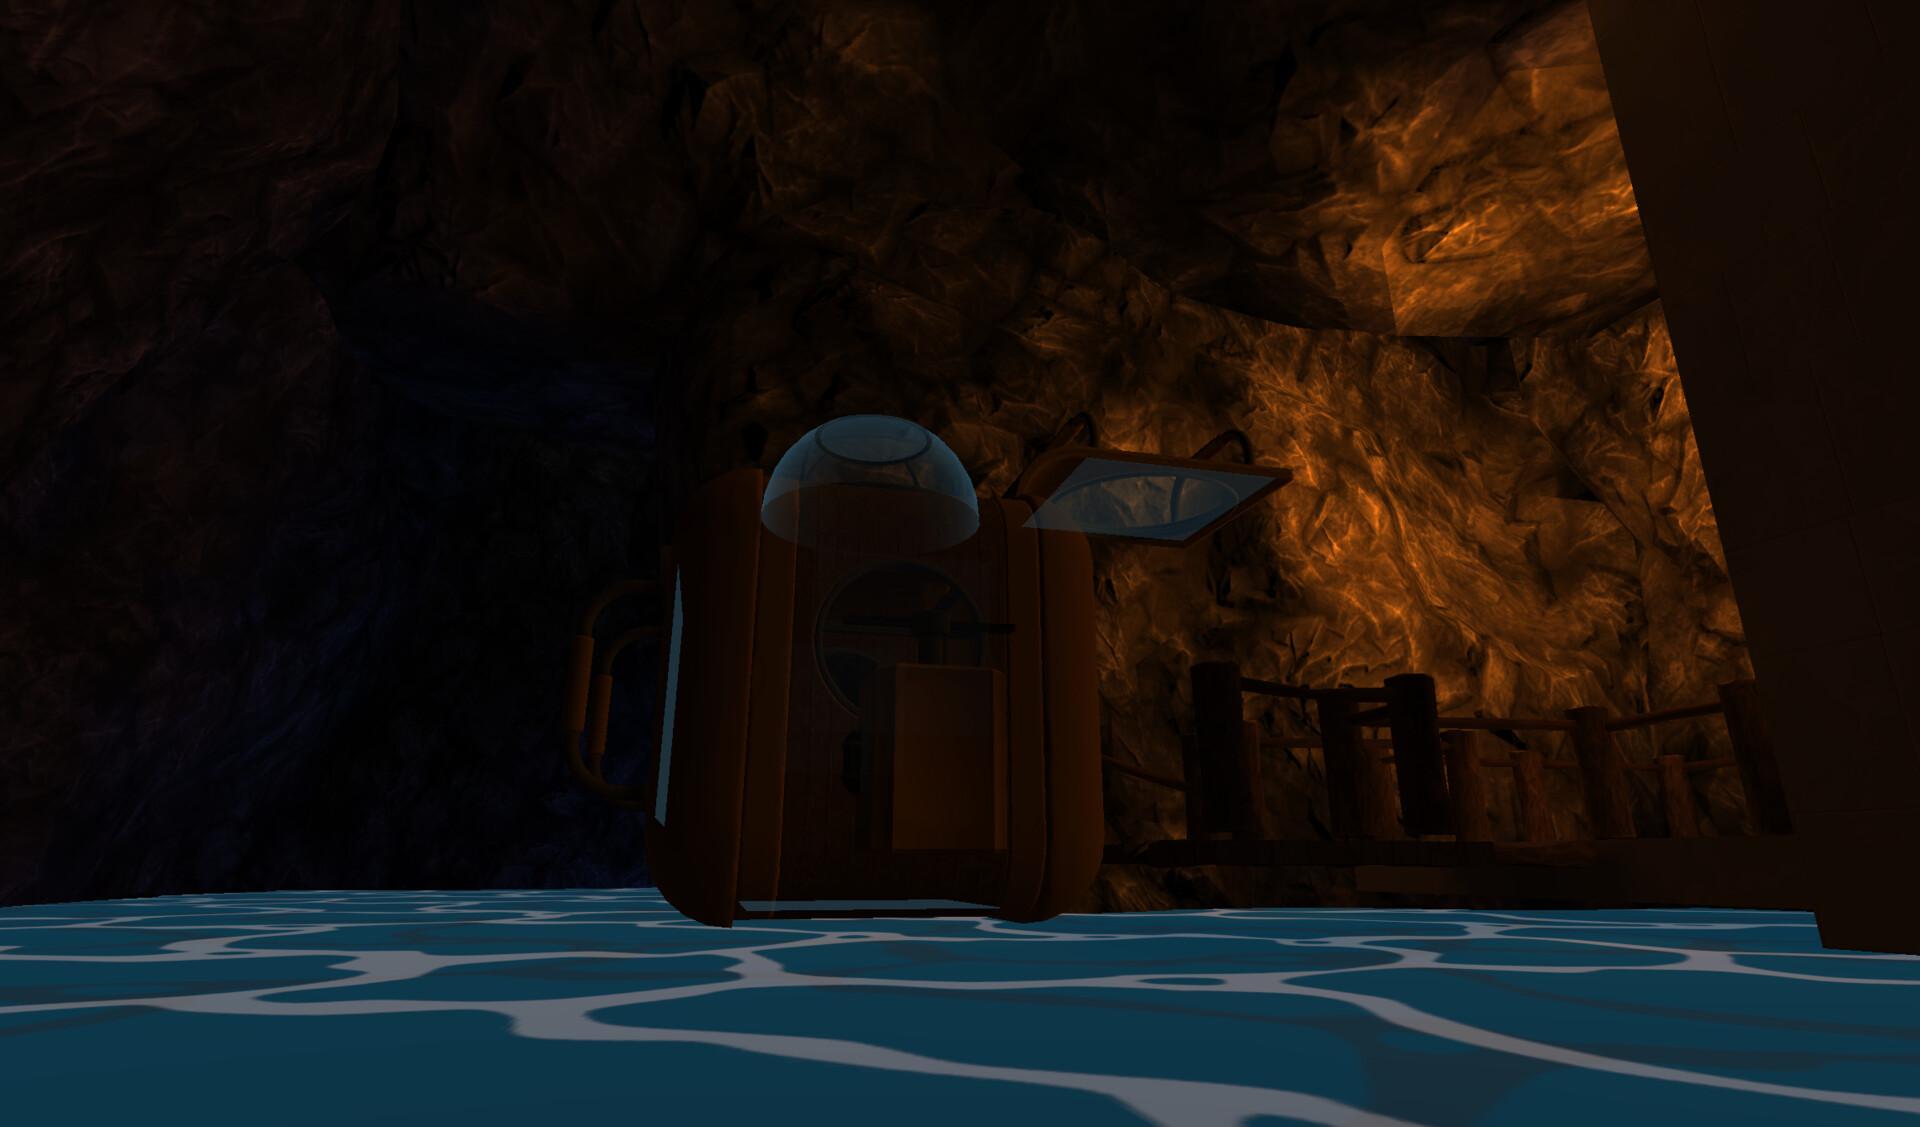 ArtStation - Parmenides / Being An OculusGo VR Experience